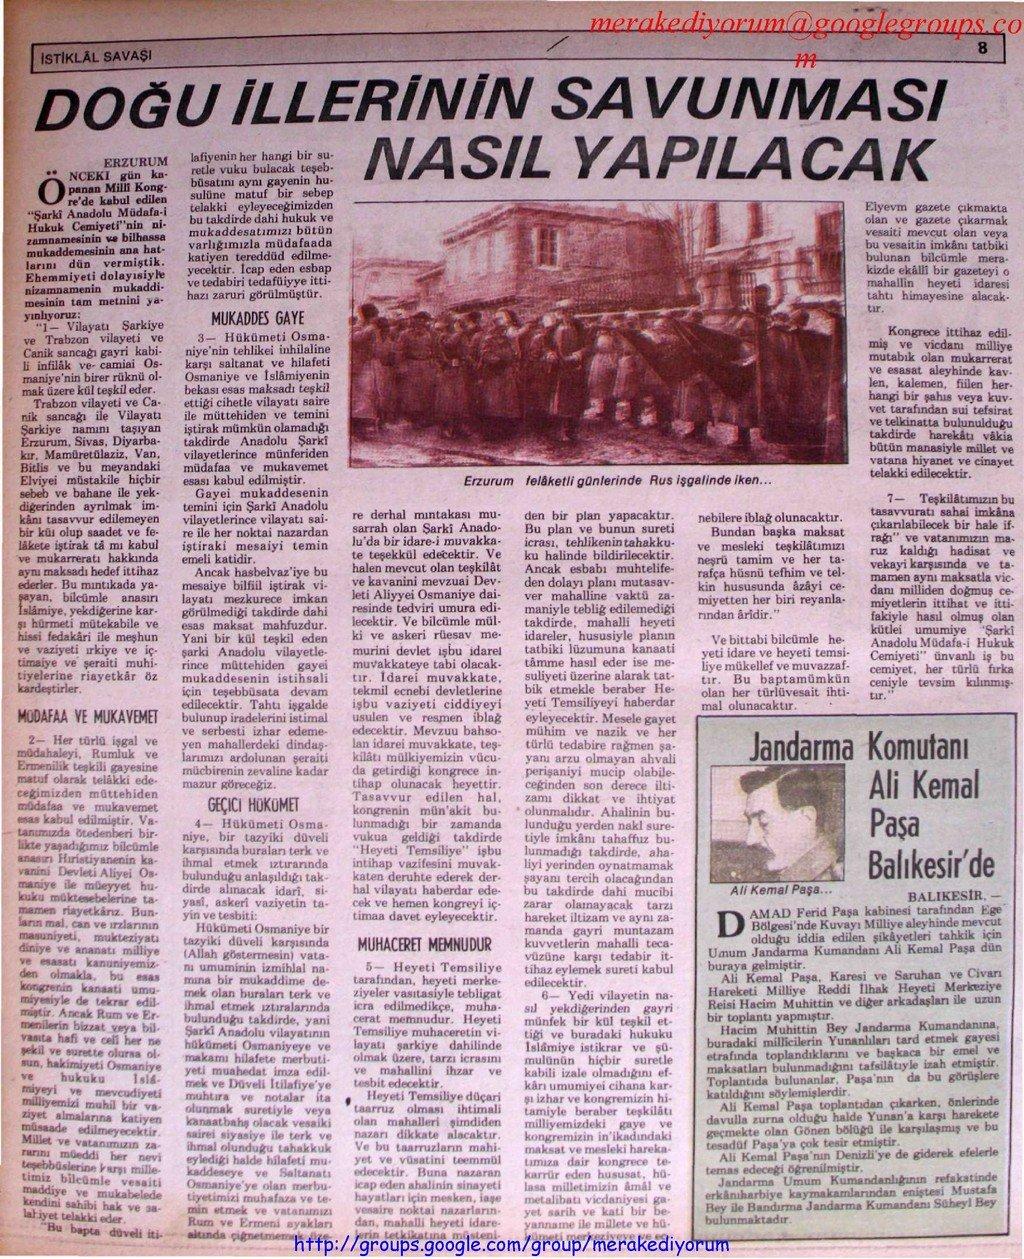 istiklal savaşı gazetesi - 9 ağustos 1919